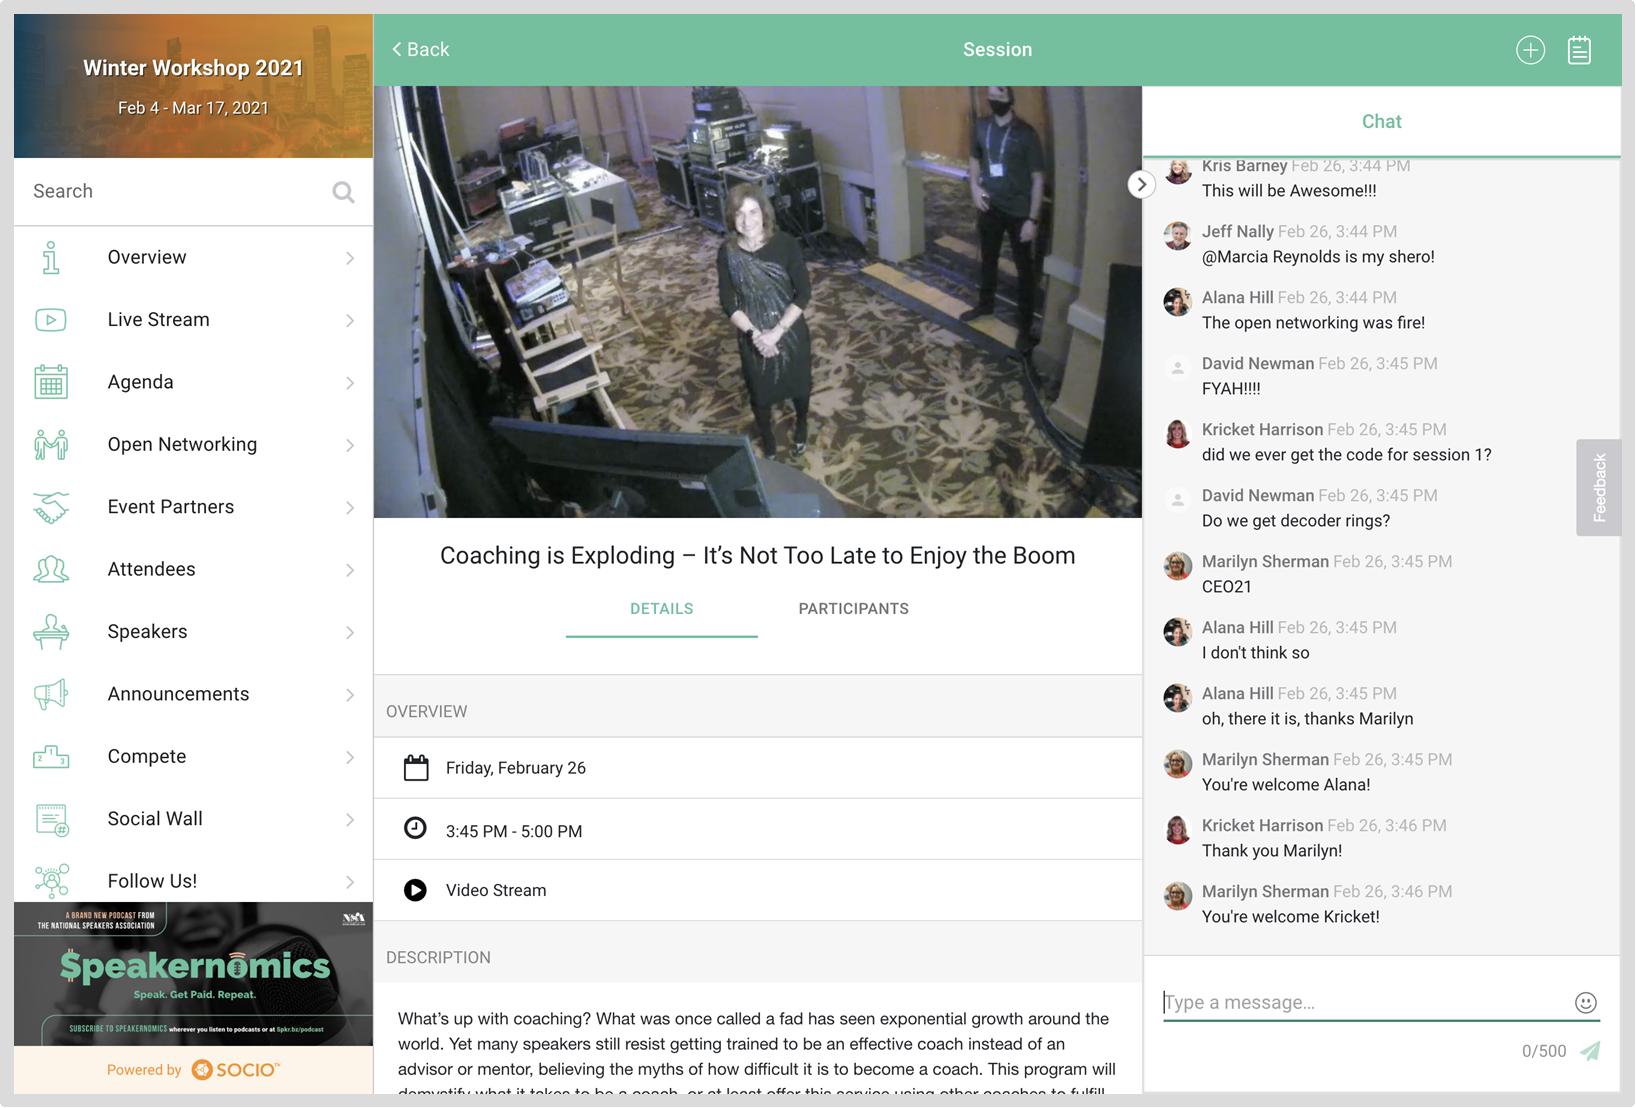 Screenshot of an RTMP live stream in an event.